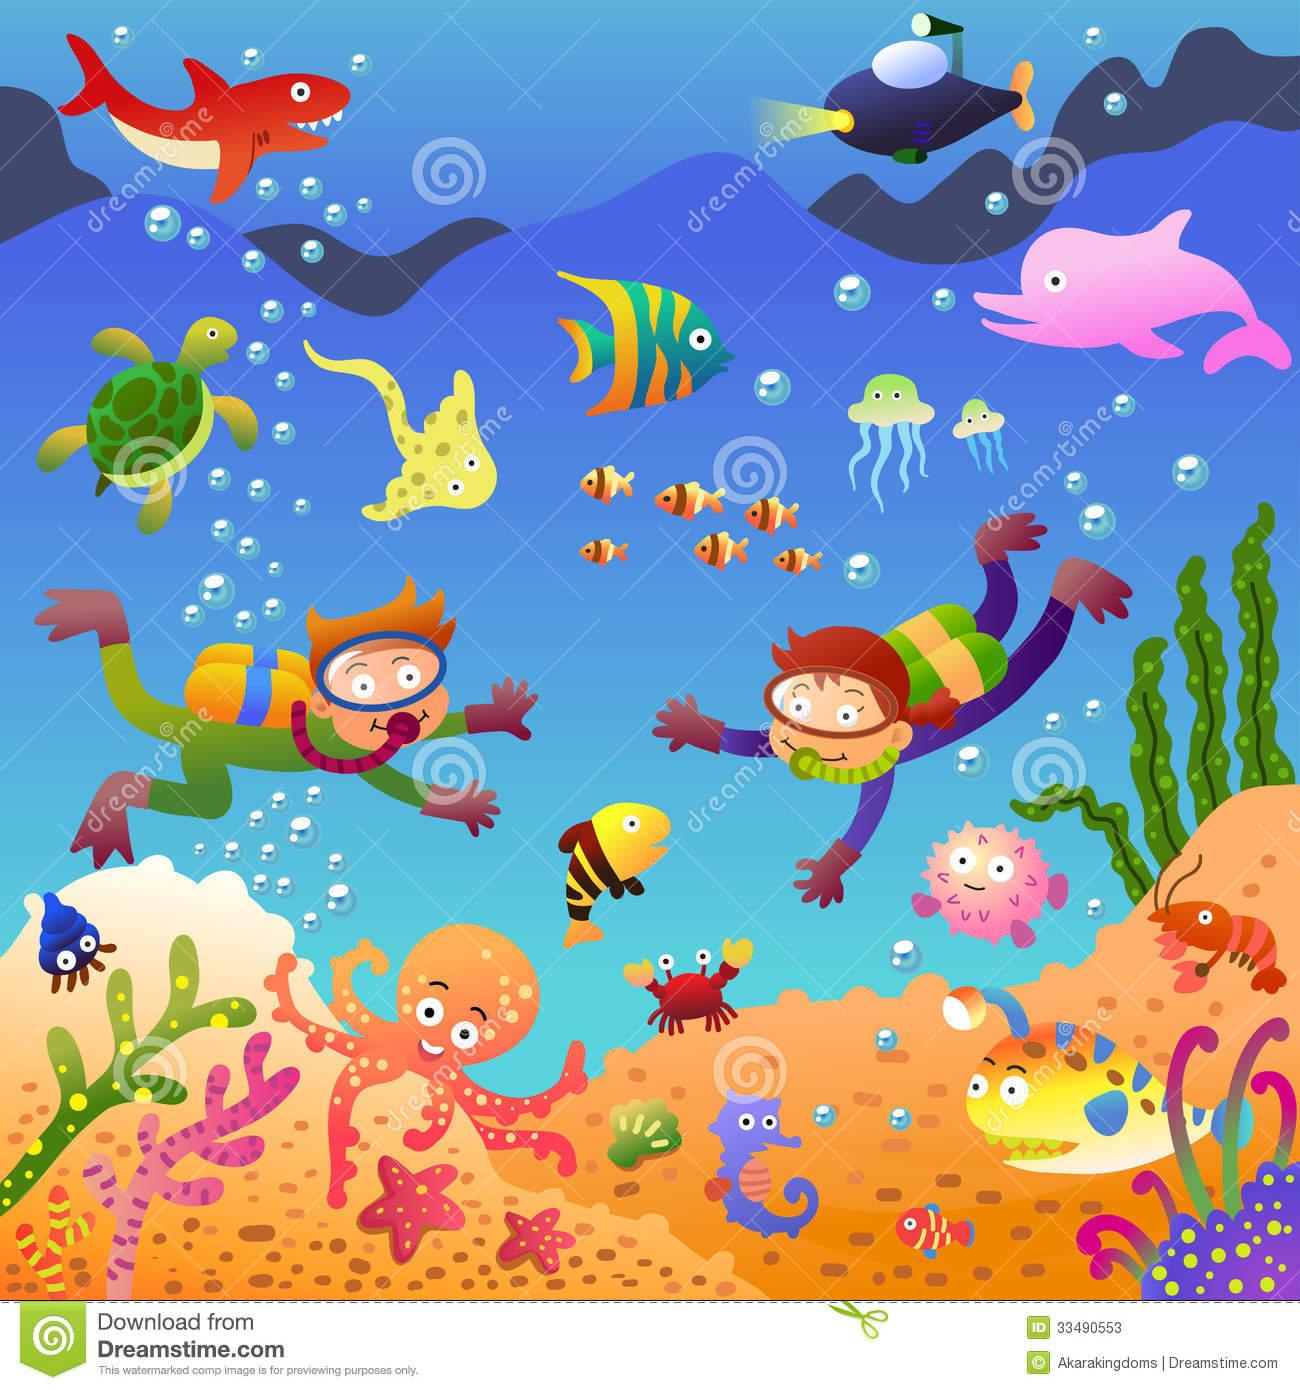 9+ Under The Sea Clipart.